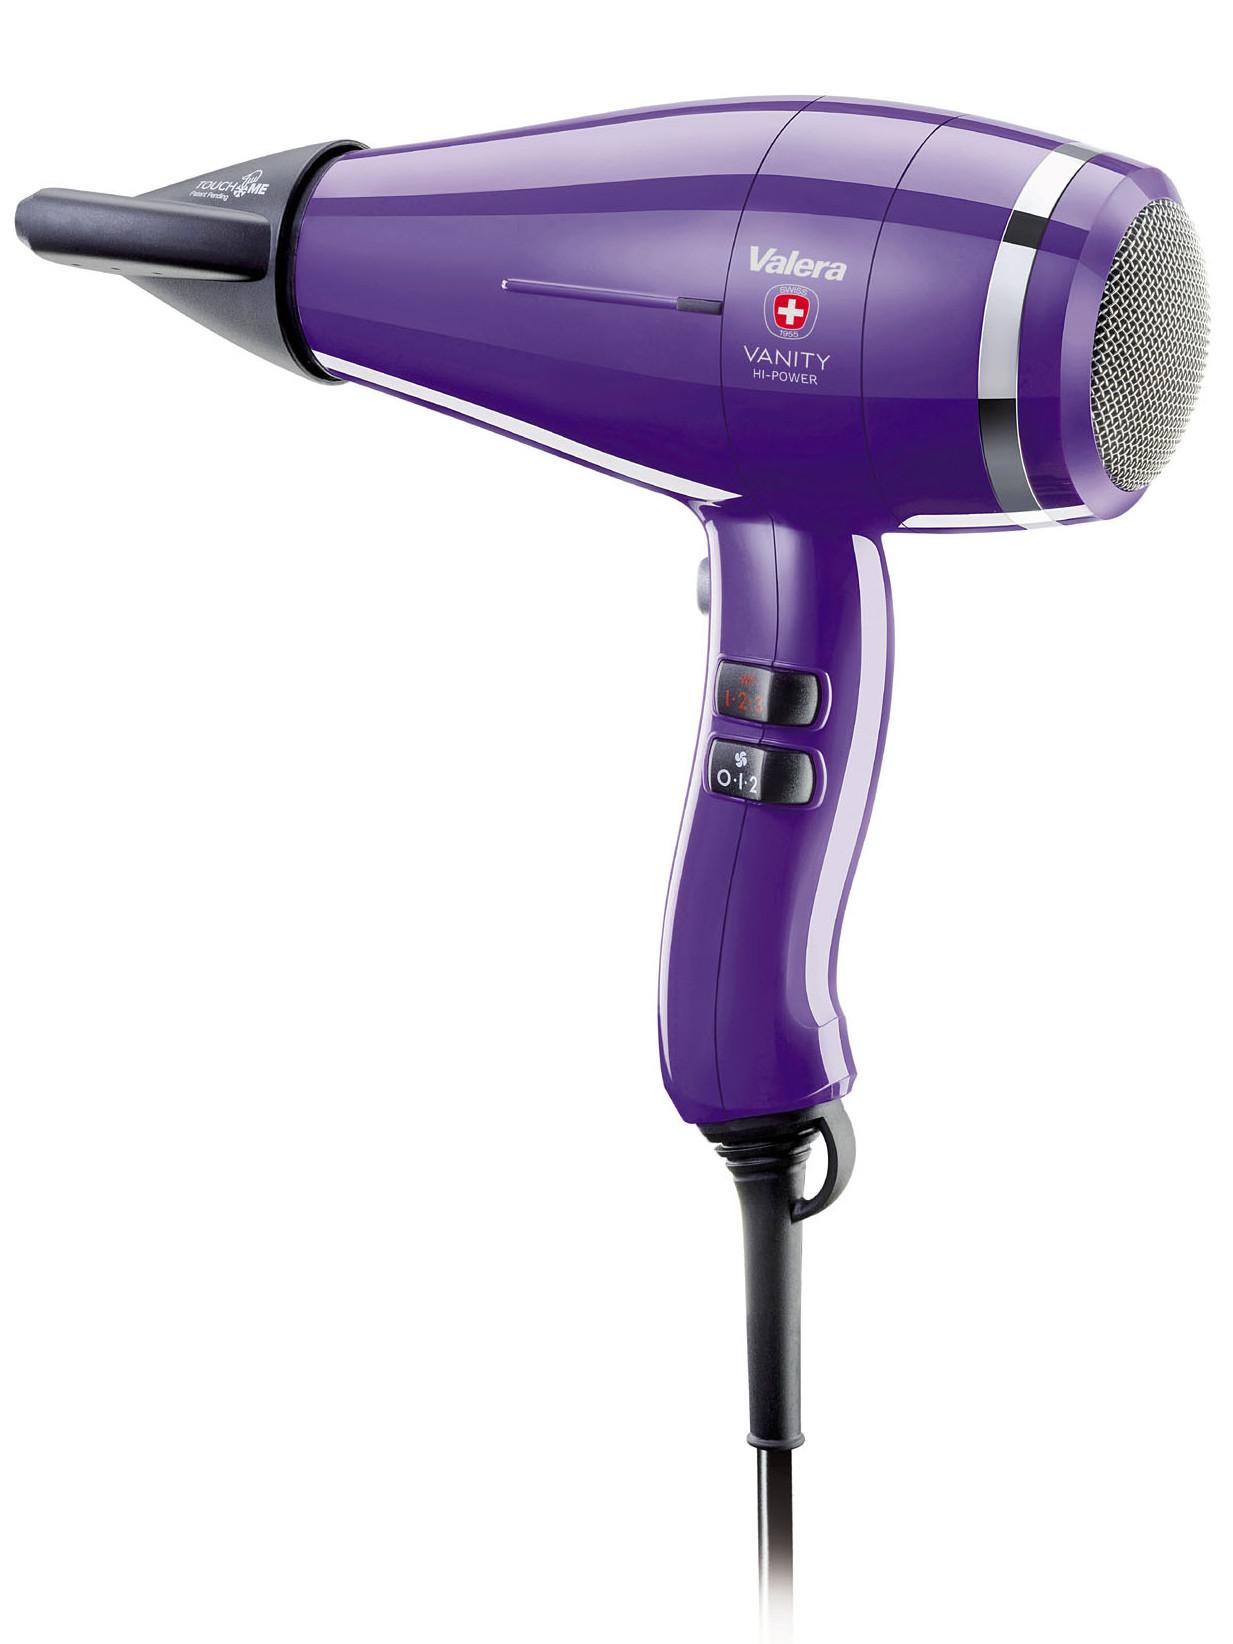 Profesionální fén Valera Vanity Hi-Power Pretty Purple - 2400 W, fialový (VA8605RCPP) + DÁREK ZDARMA